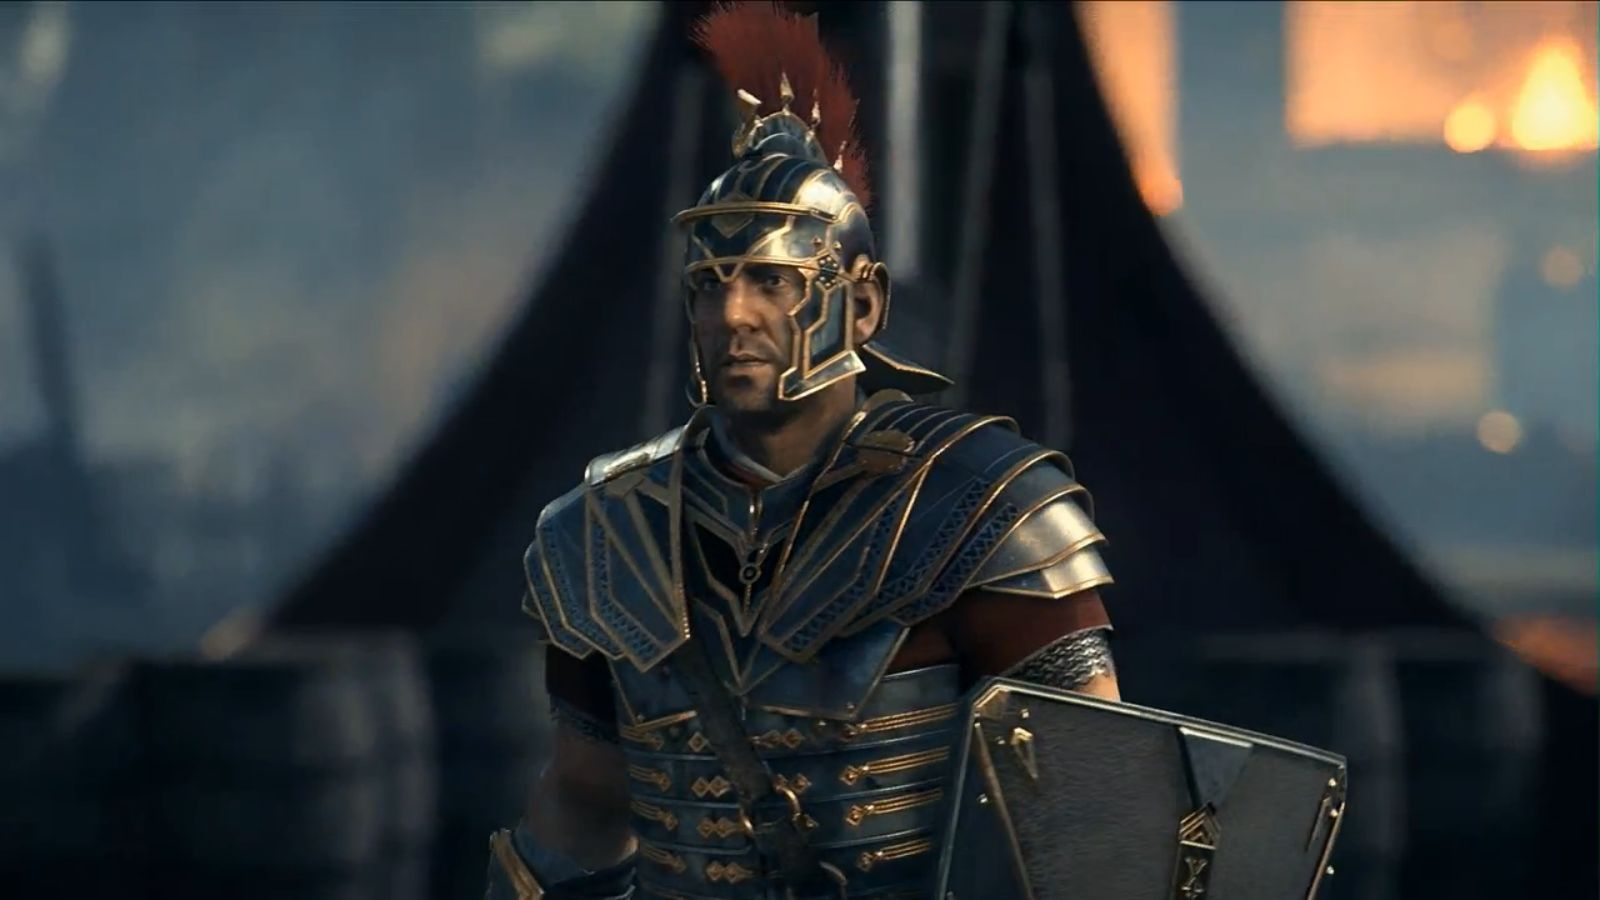 roman warrior wallpaper - photo #16